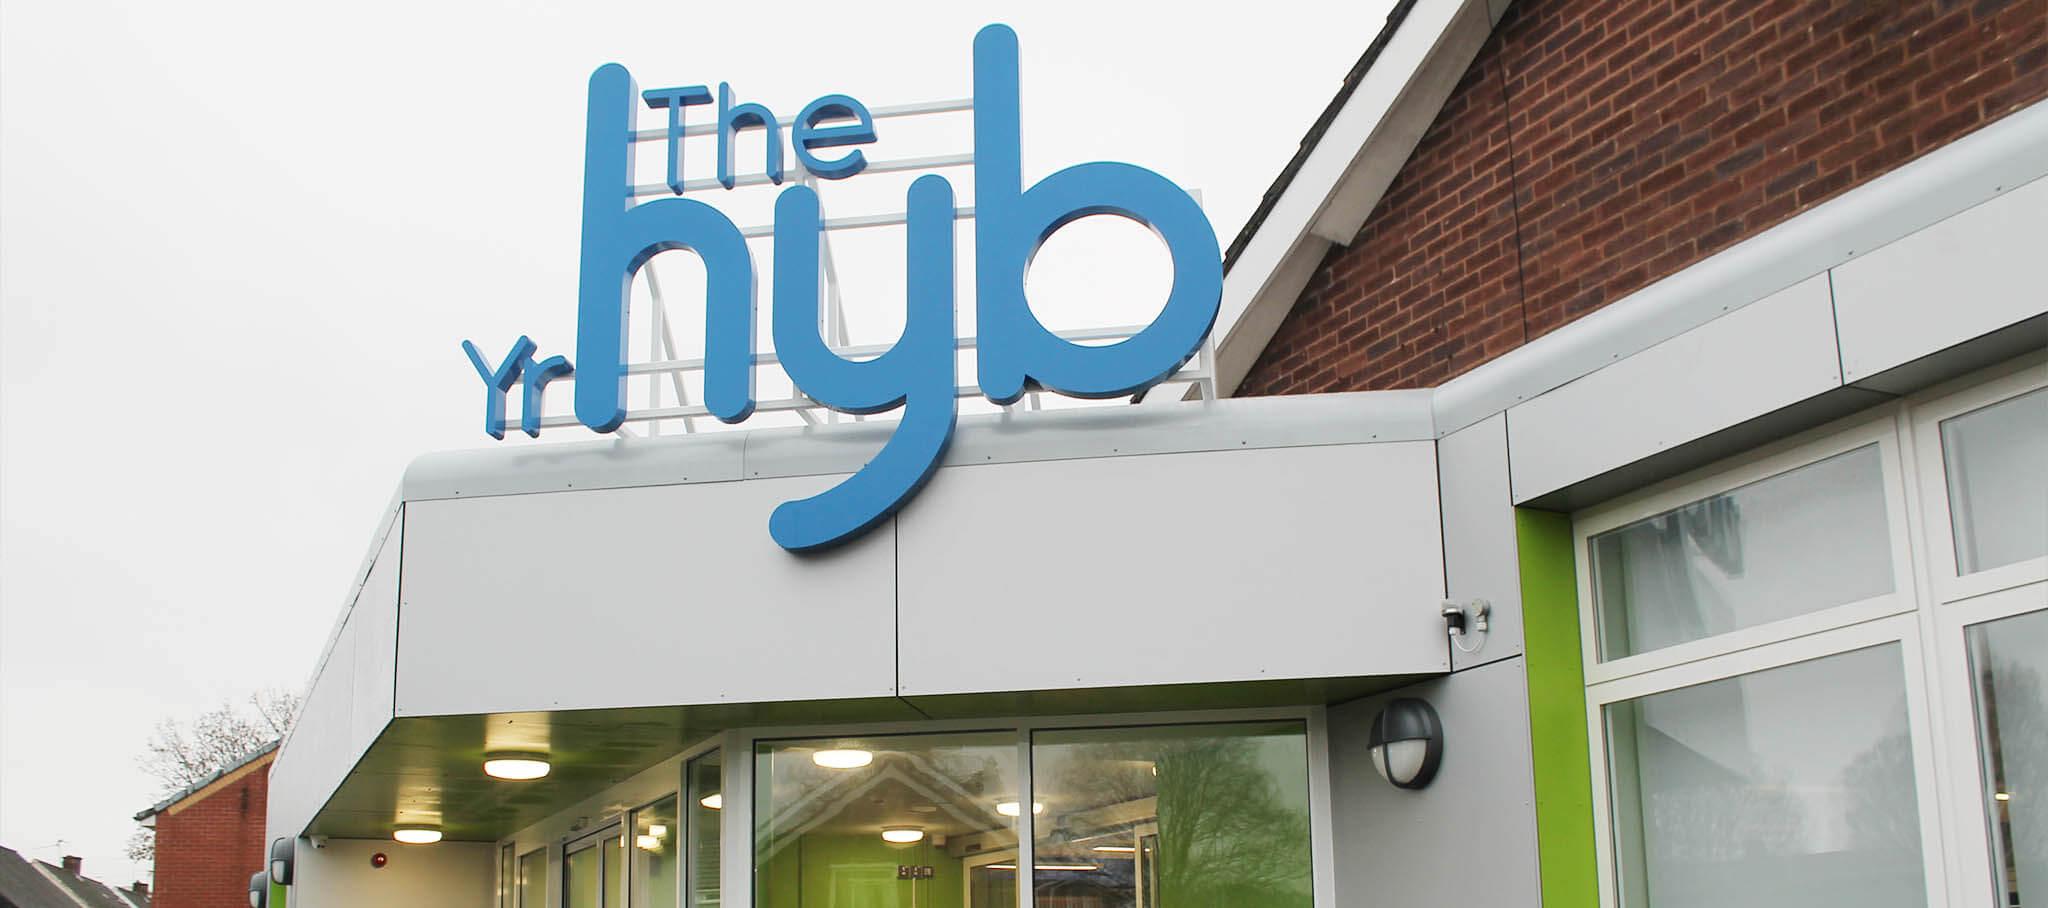 Photo of Llandaff North Hub